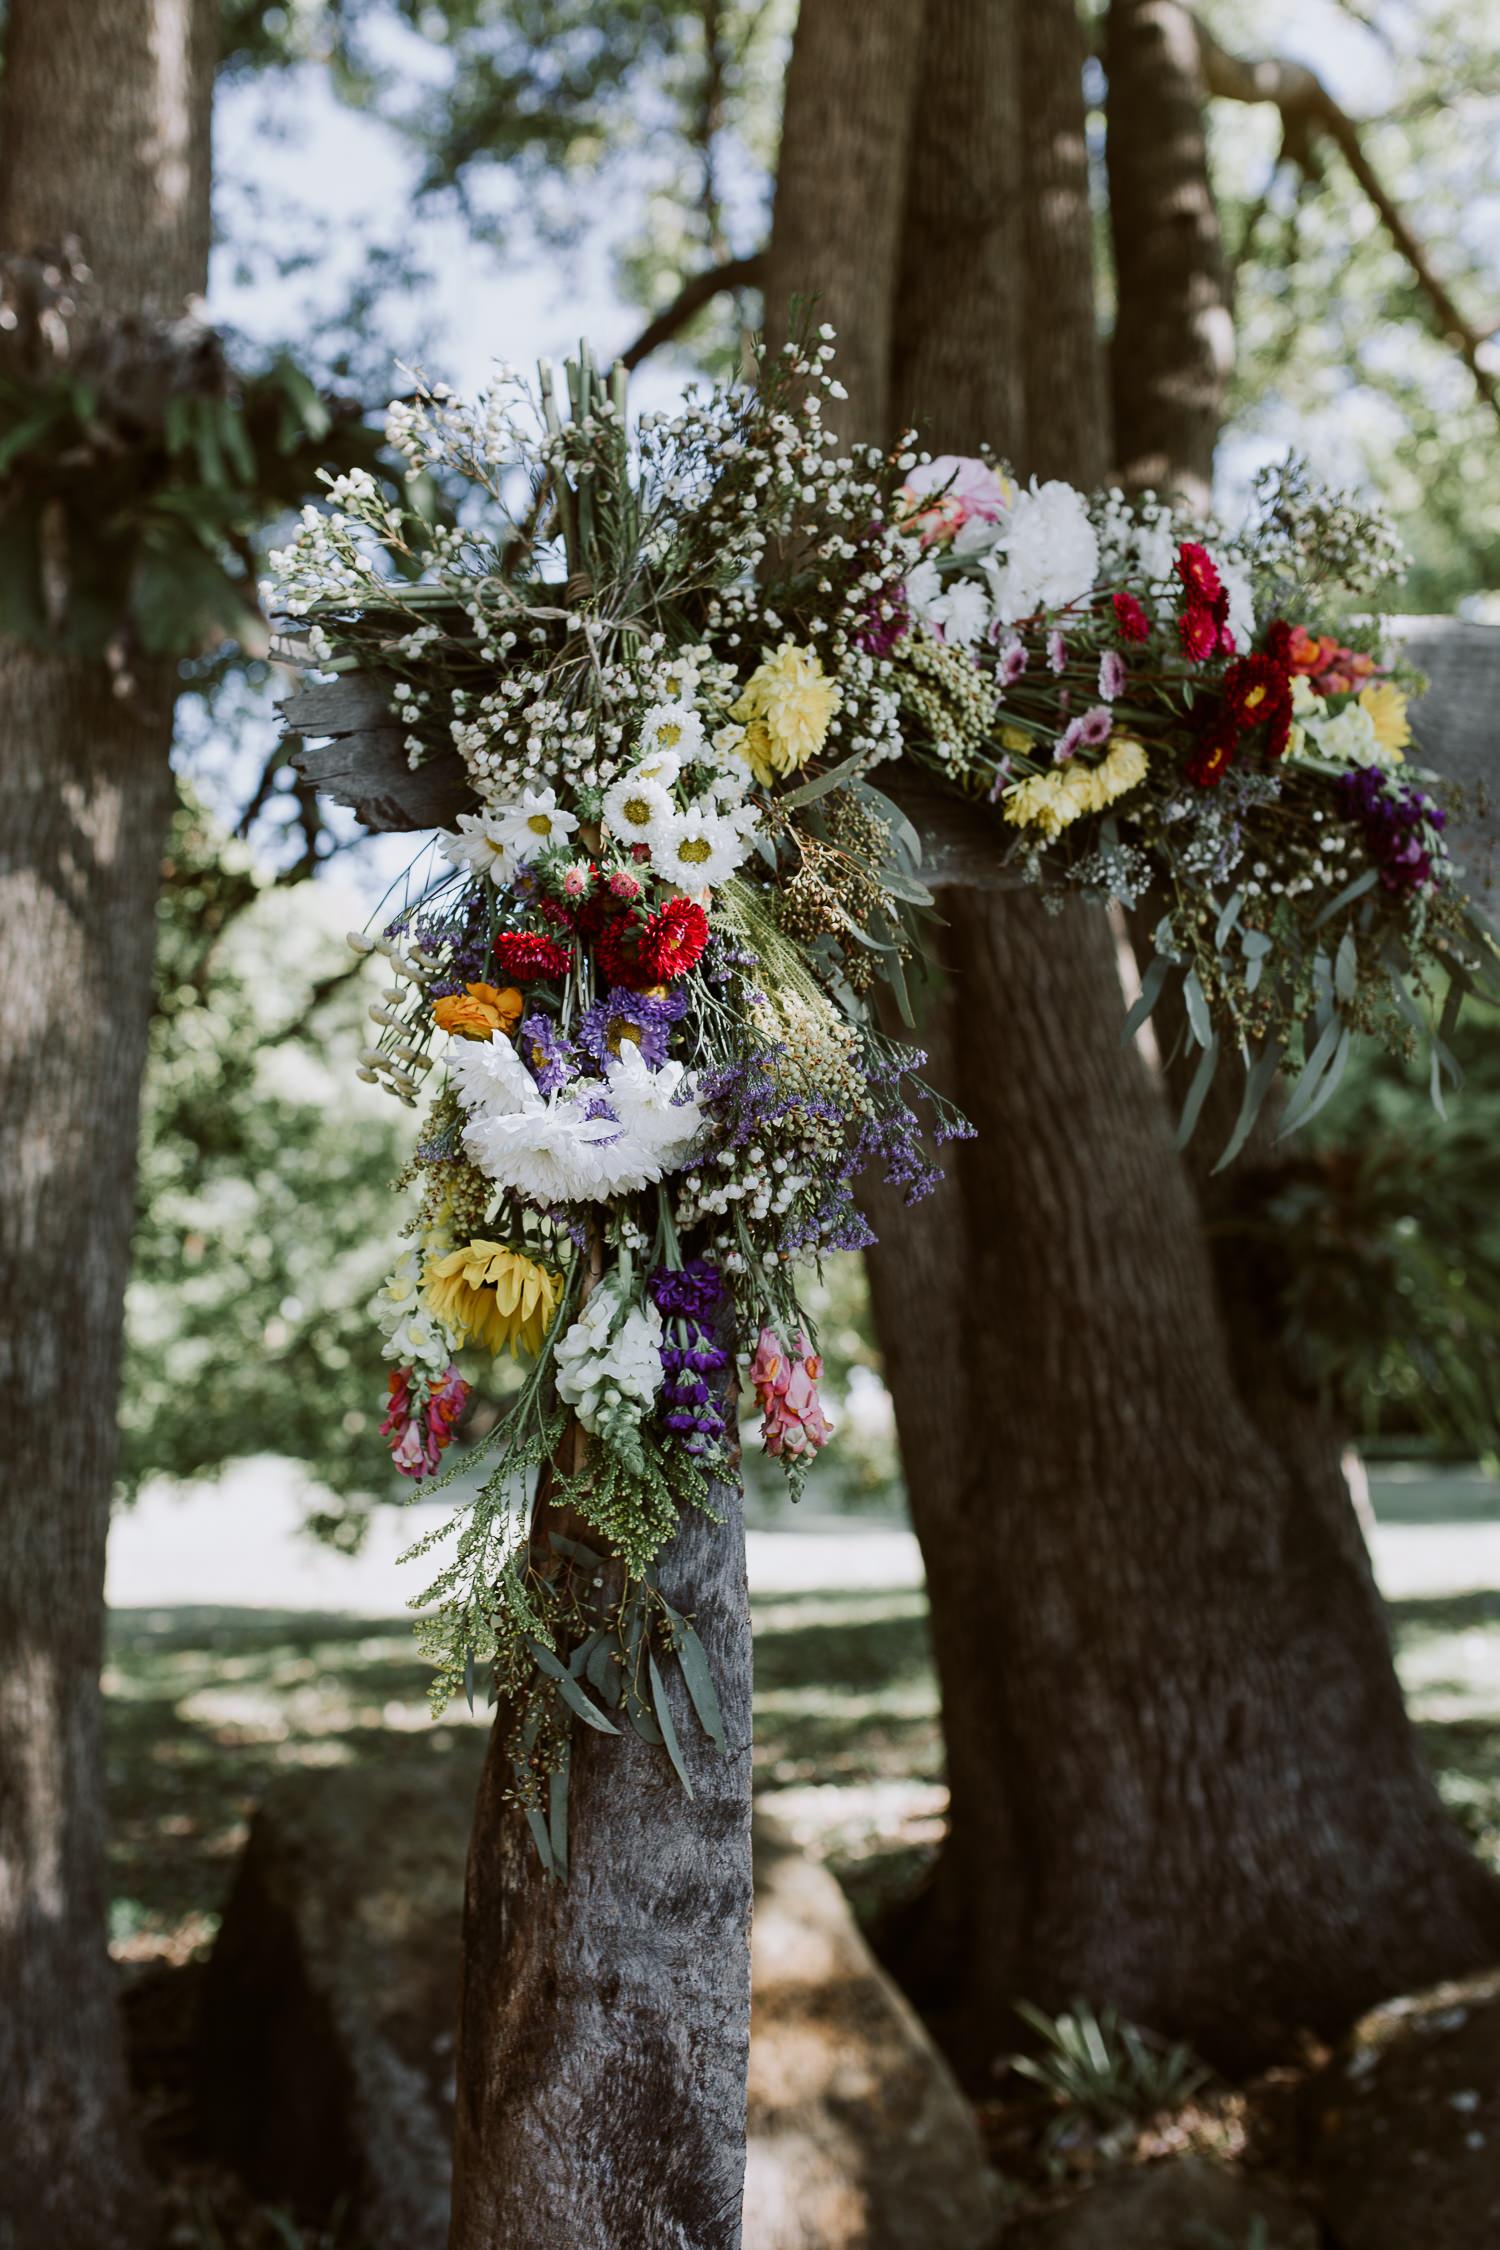 byron_bay_wedding_photographer027.jpg